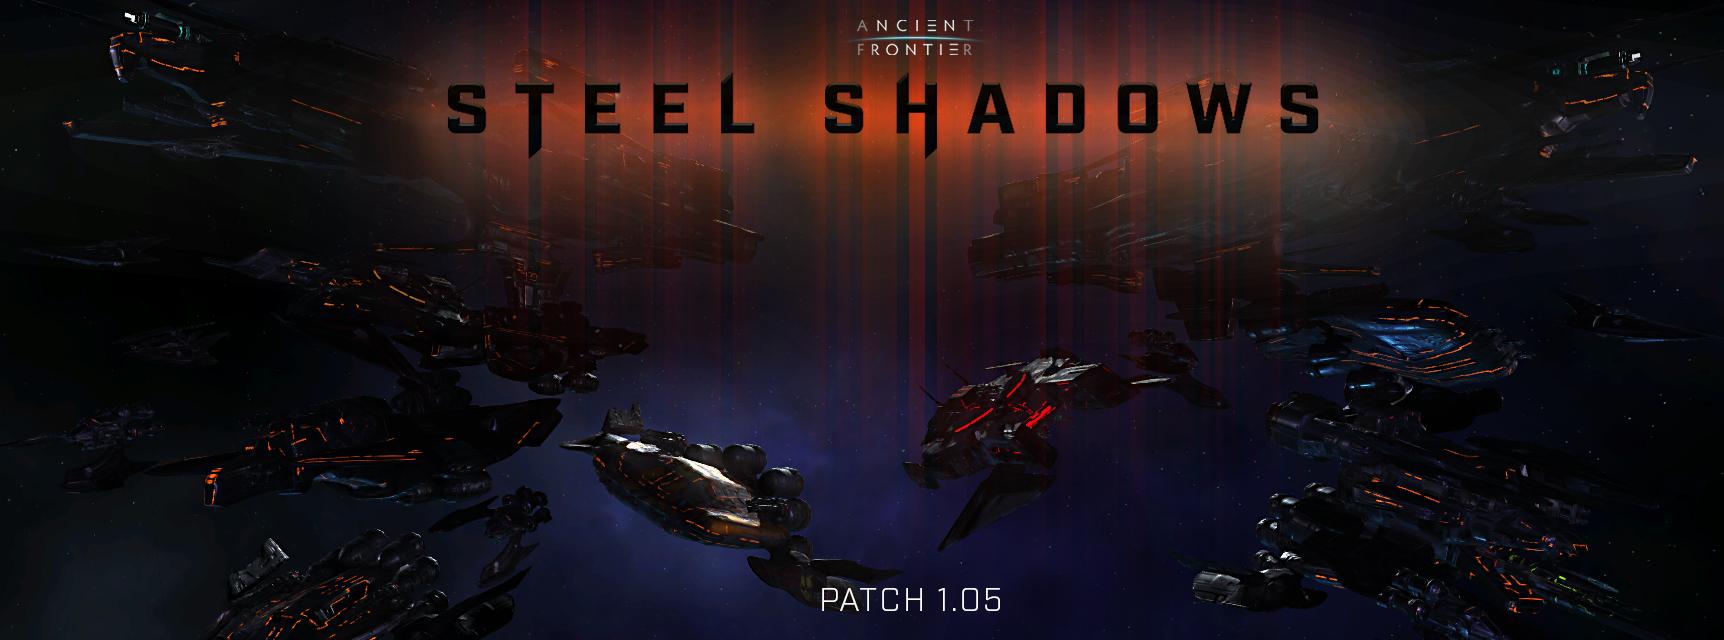 ancient frontier steel shadows *2018